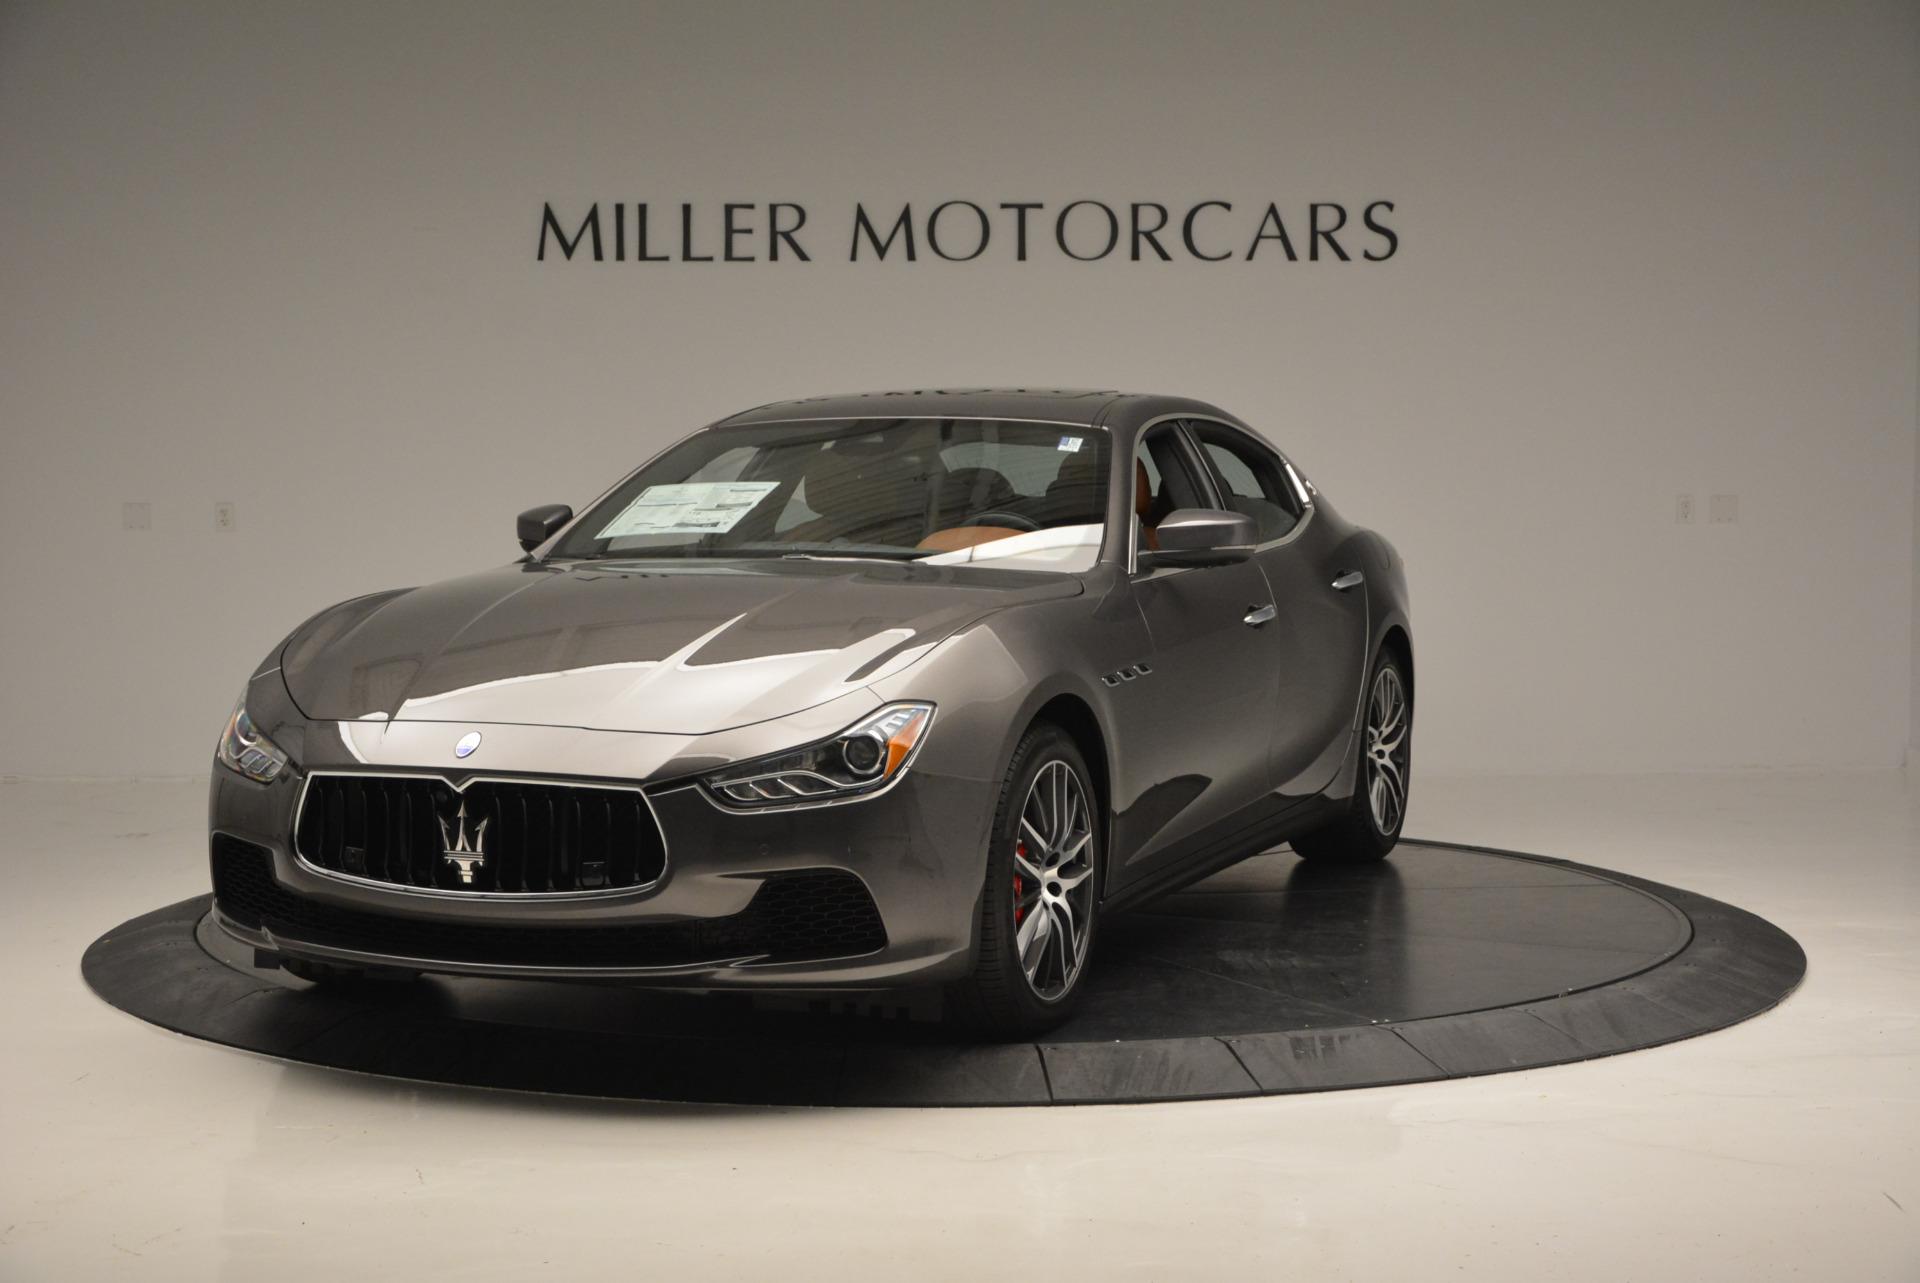 New 2017 Maserati Ghibli S Q4 For Sale In Greenwich, CT 574_main